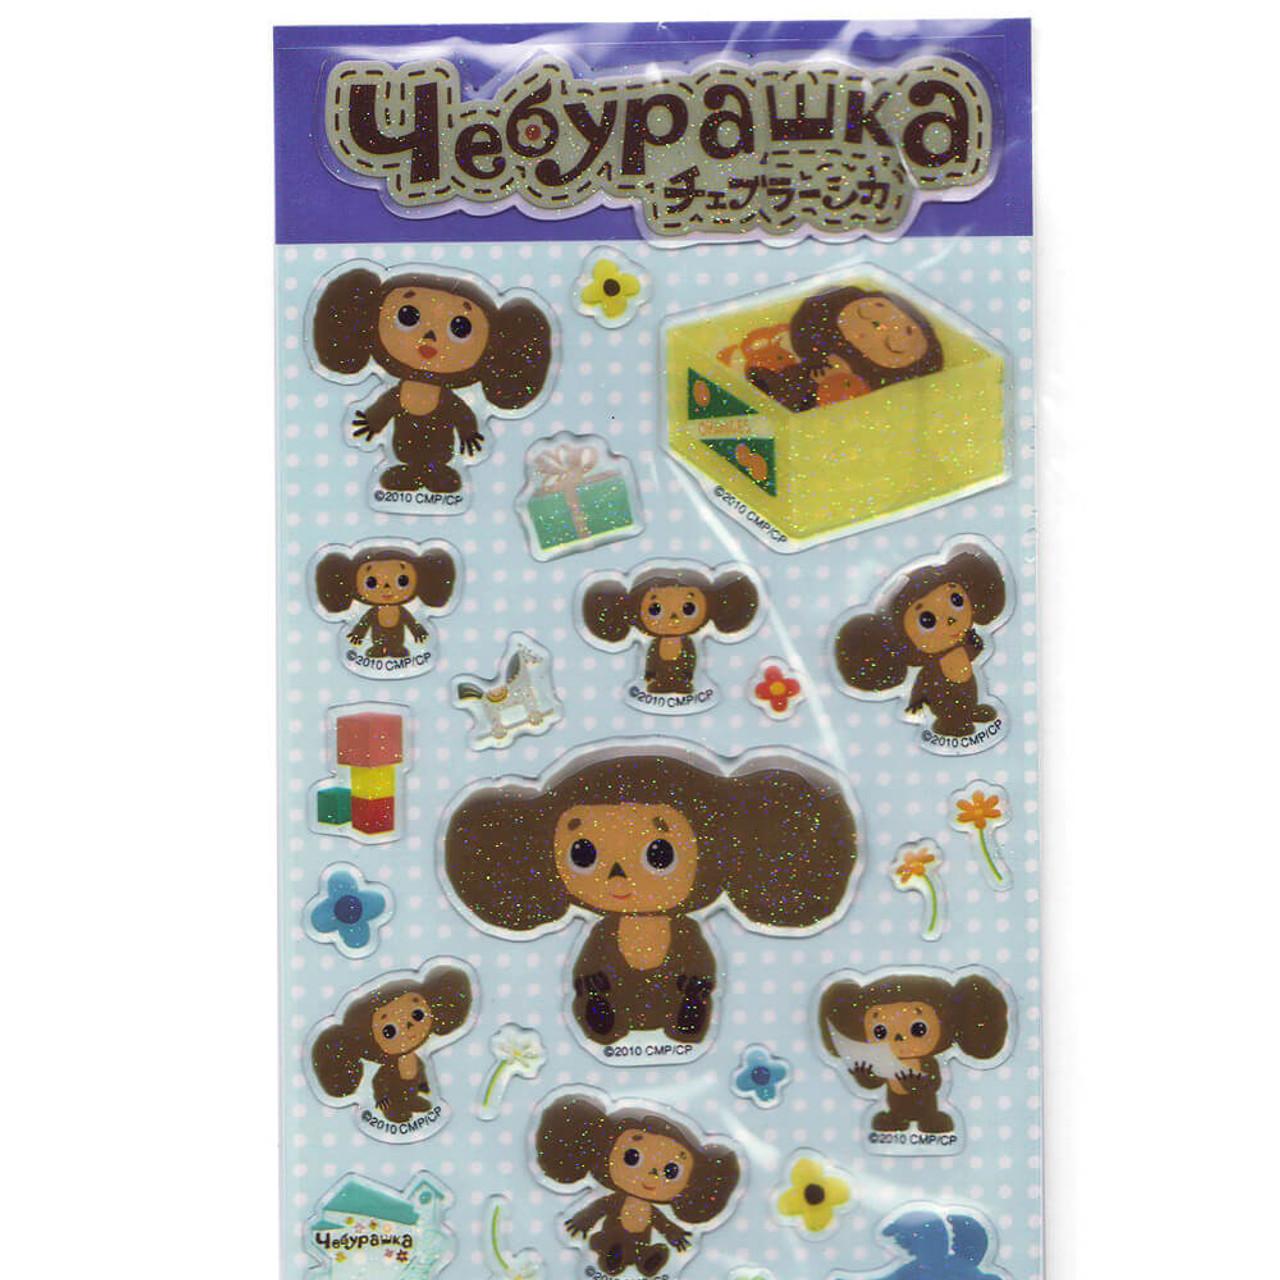 Cheburashka Yeoypawka 3D Puffy Sticker CHST04 - Daily ( Top Part View )